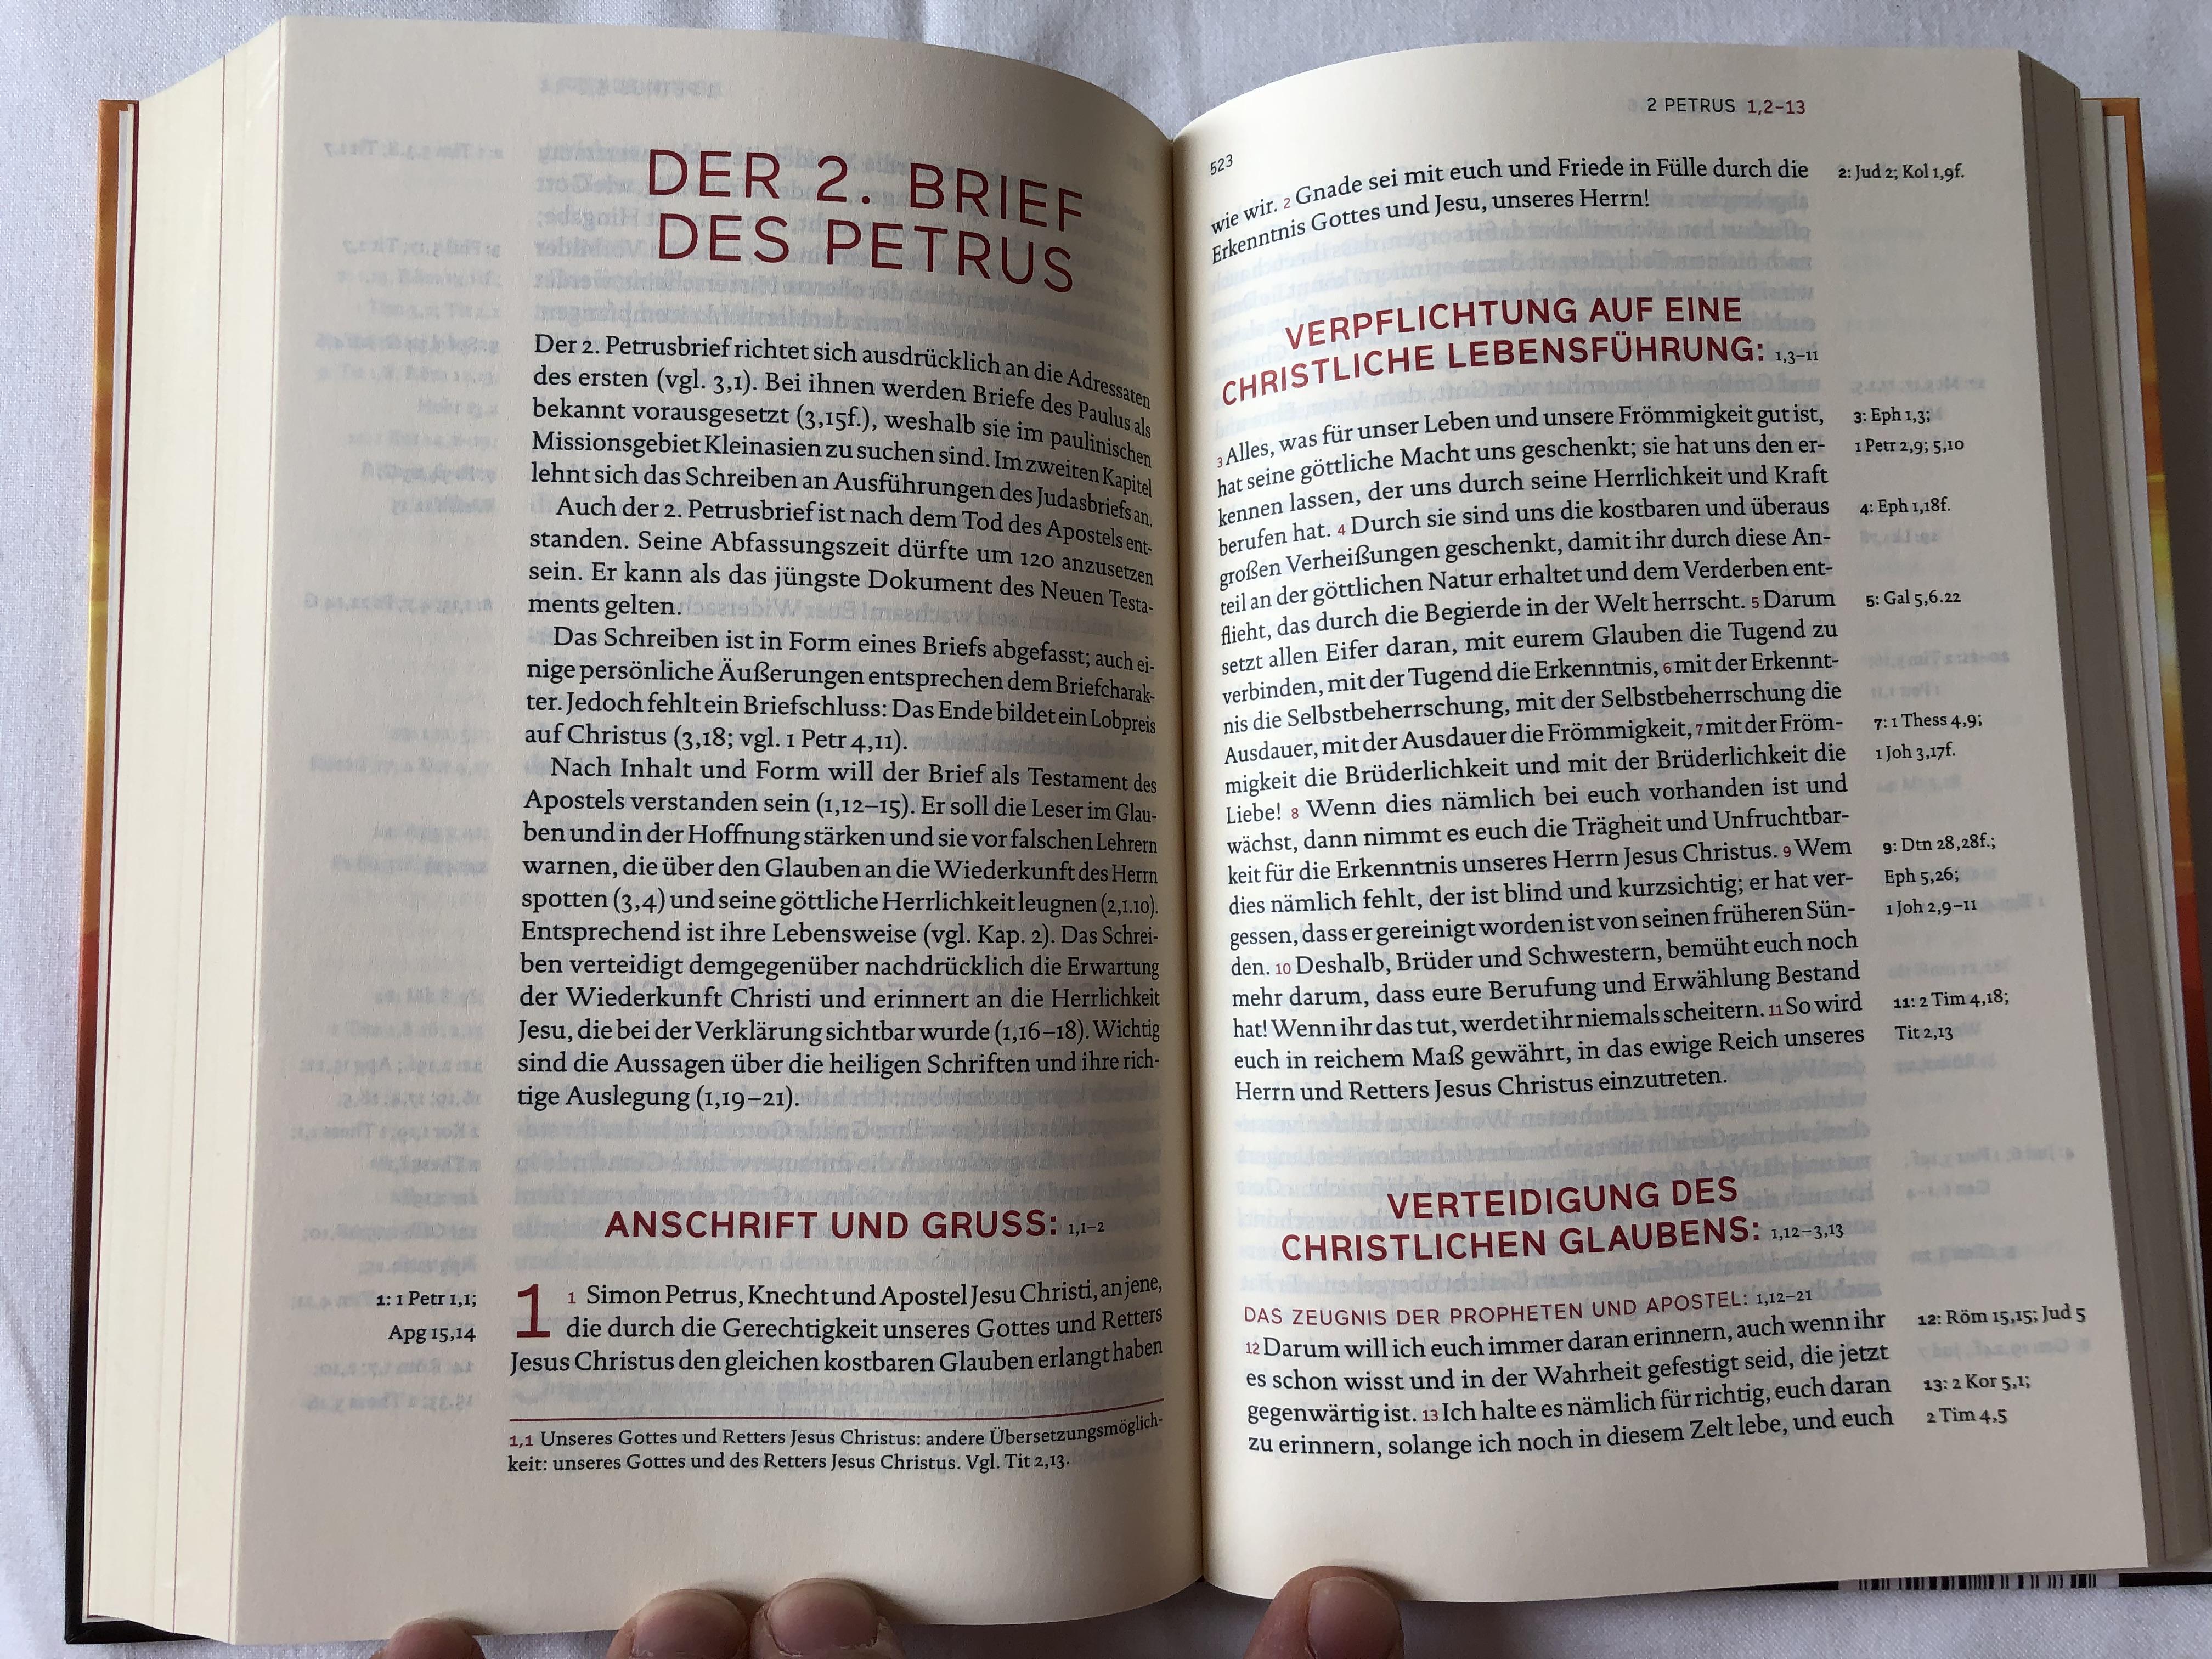 das-neue-testament-und-die-psalmen-einheits-bersetzung-german-language-new-testament-and-psalms-unitary-translation-book-introductions-references-notes-and-maps-hardcover-2018-kbw-10-.jpg